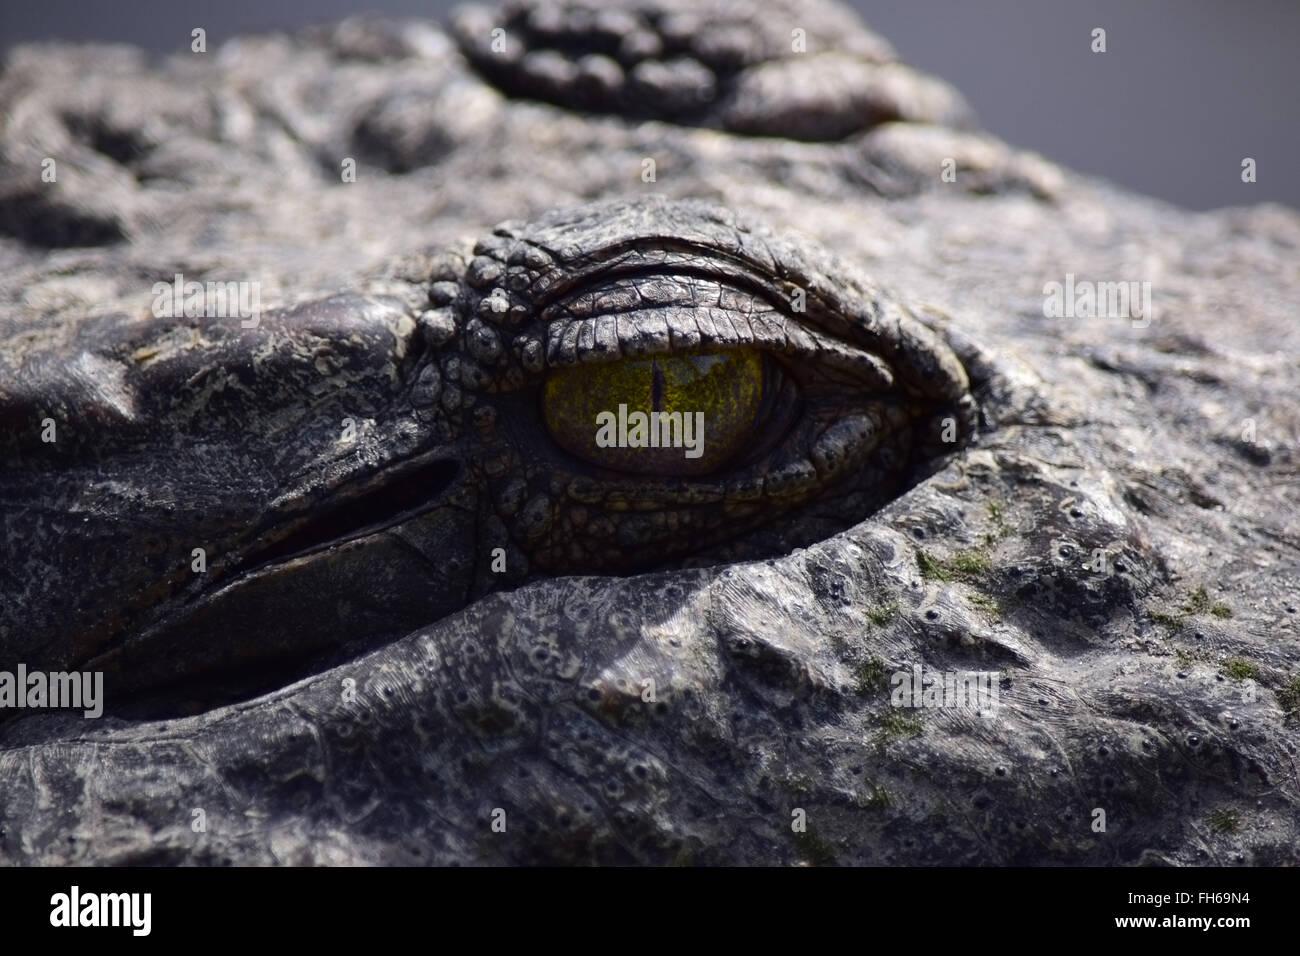 Crocodile Eye Closeup Detail - Stock Image